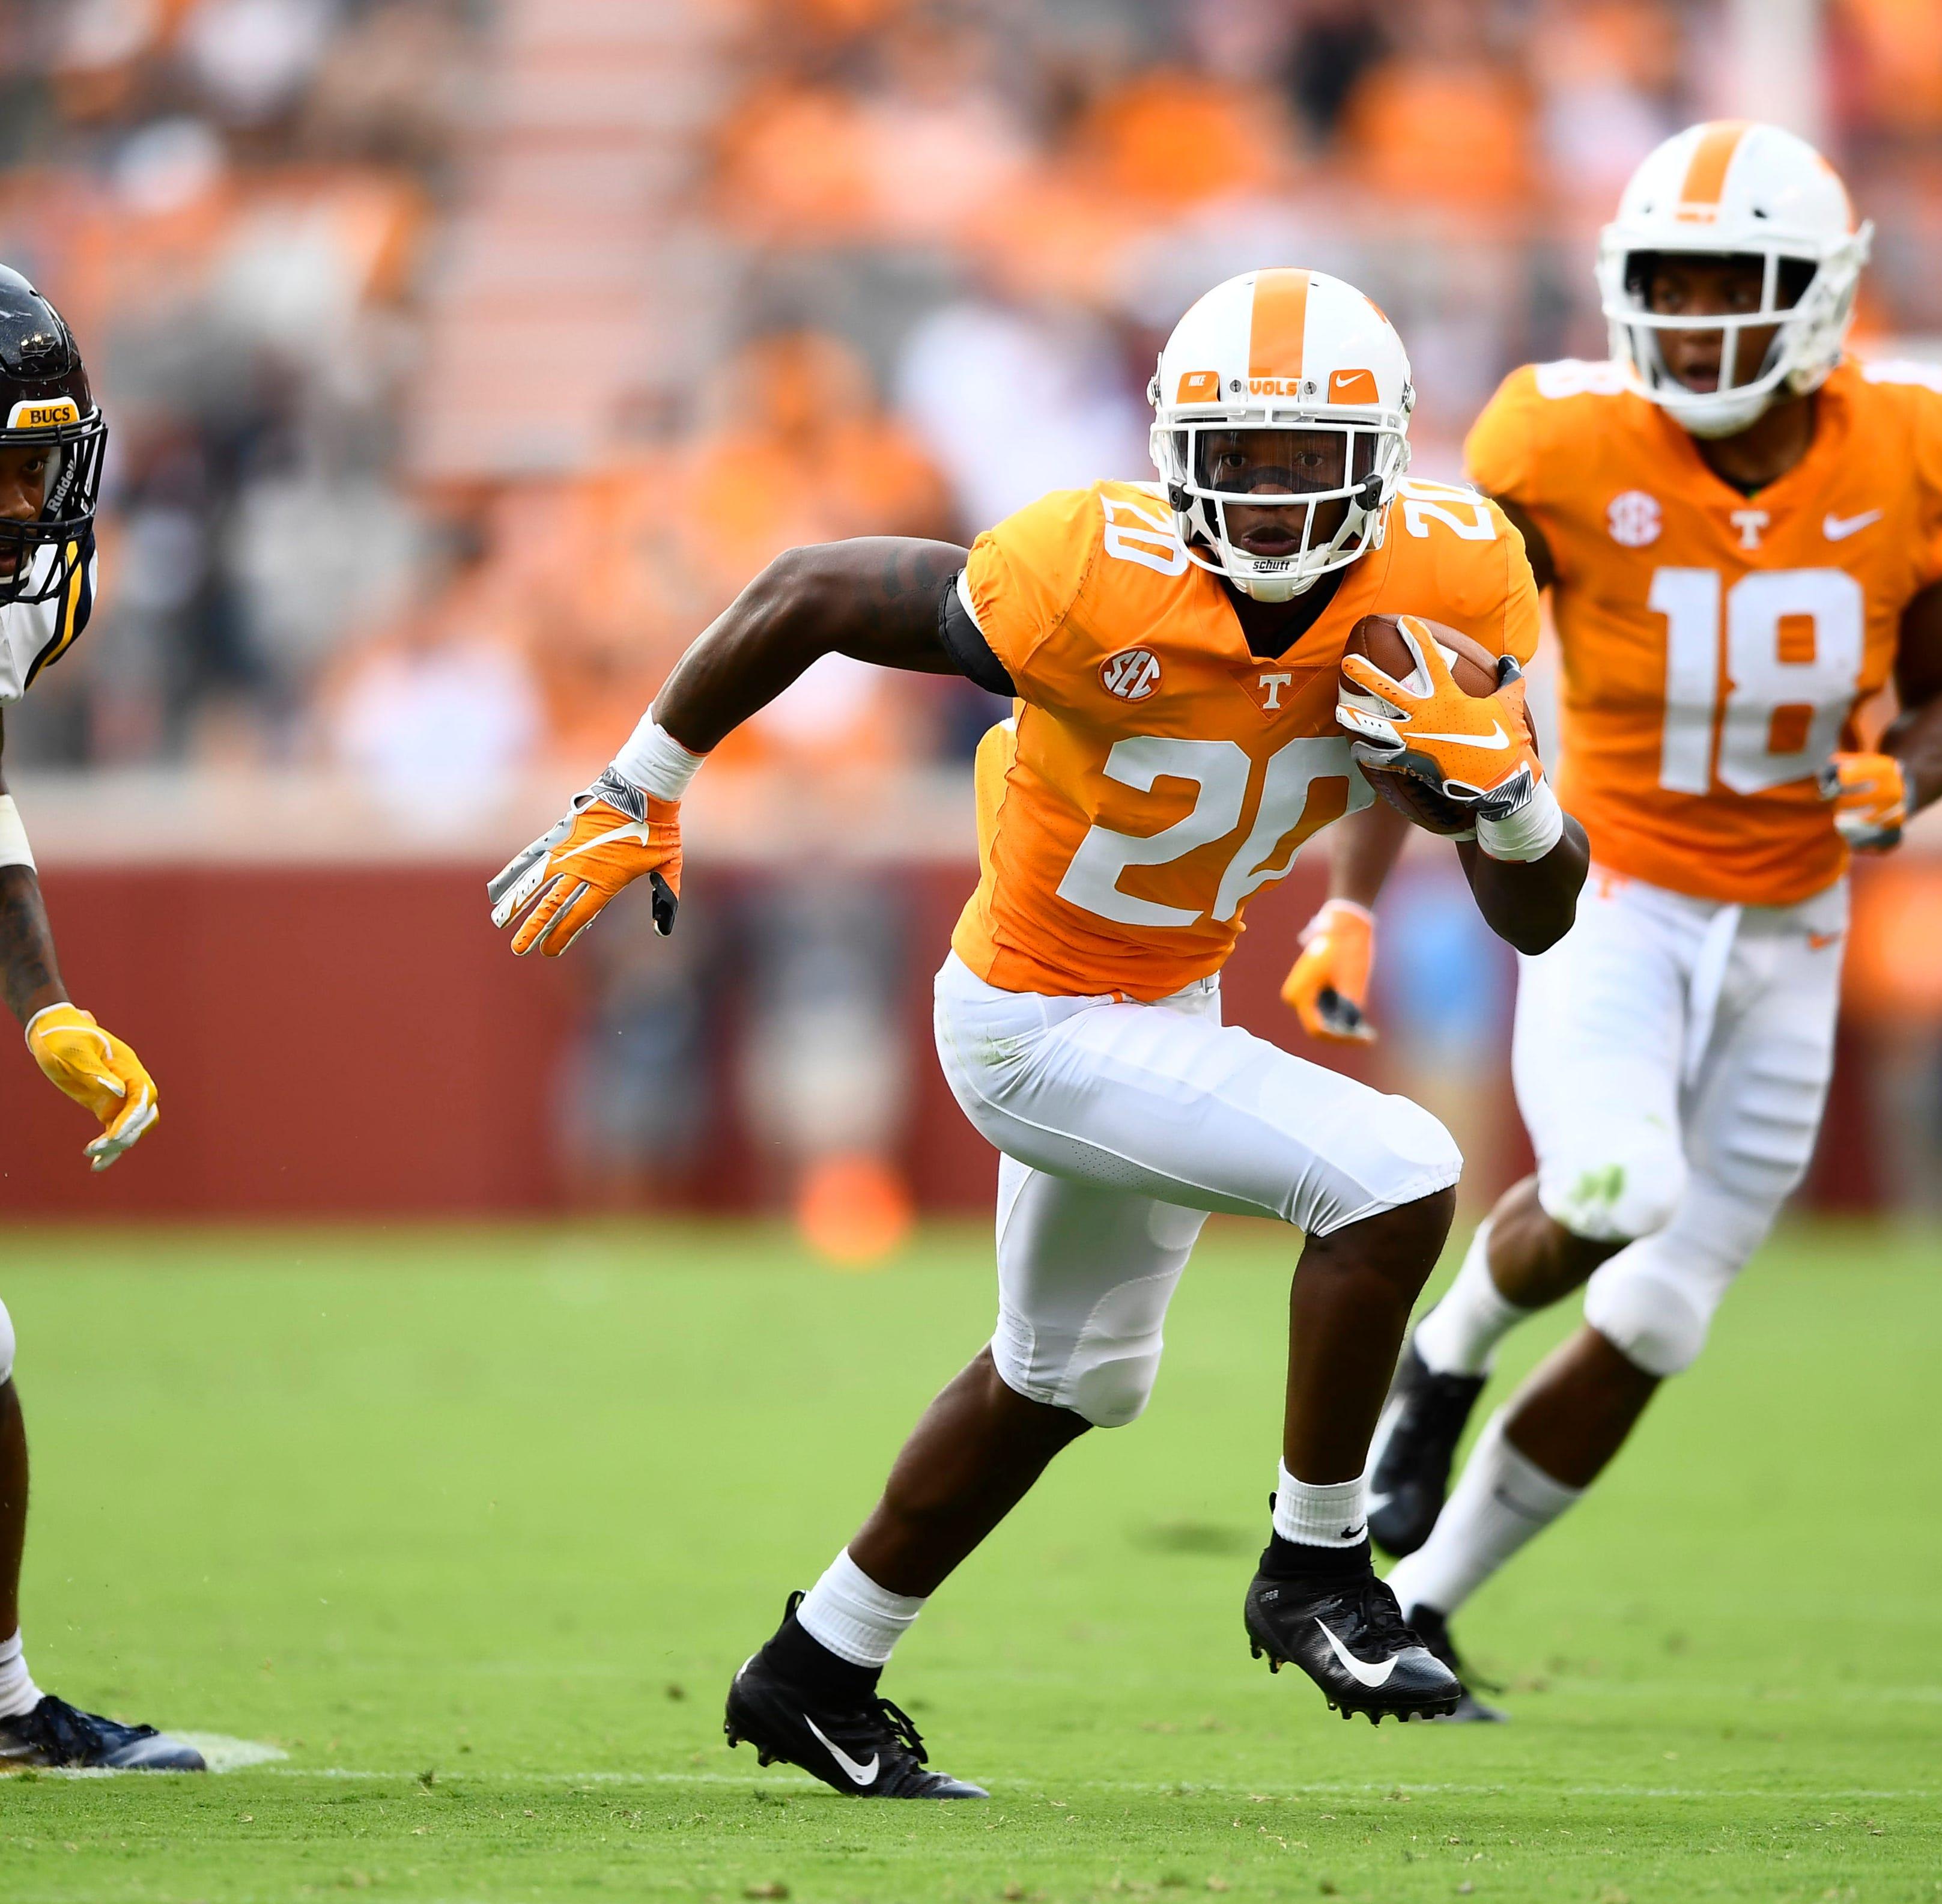 UT Vols, Vanderbilt each have one player selected to SEC All-Freshman team